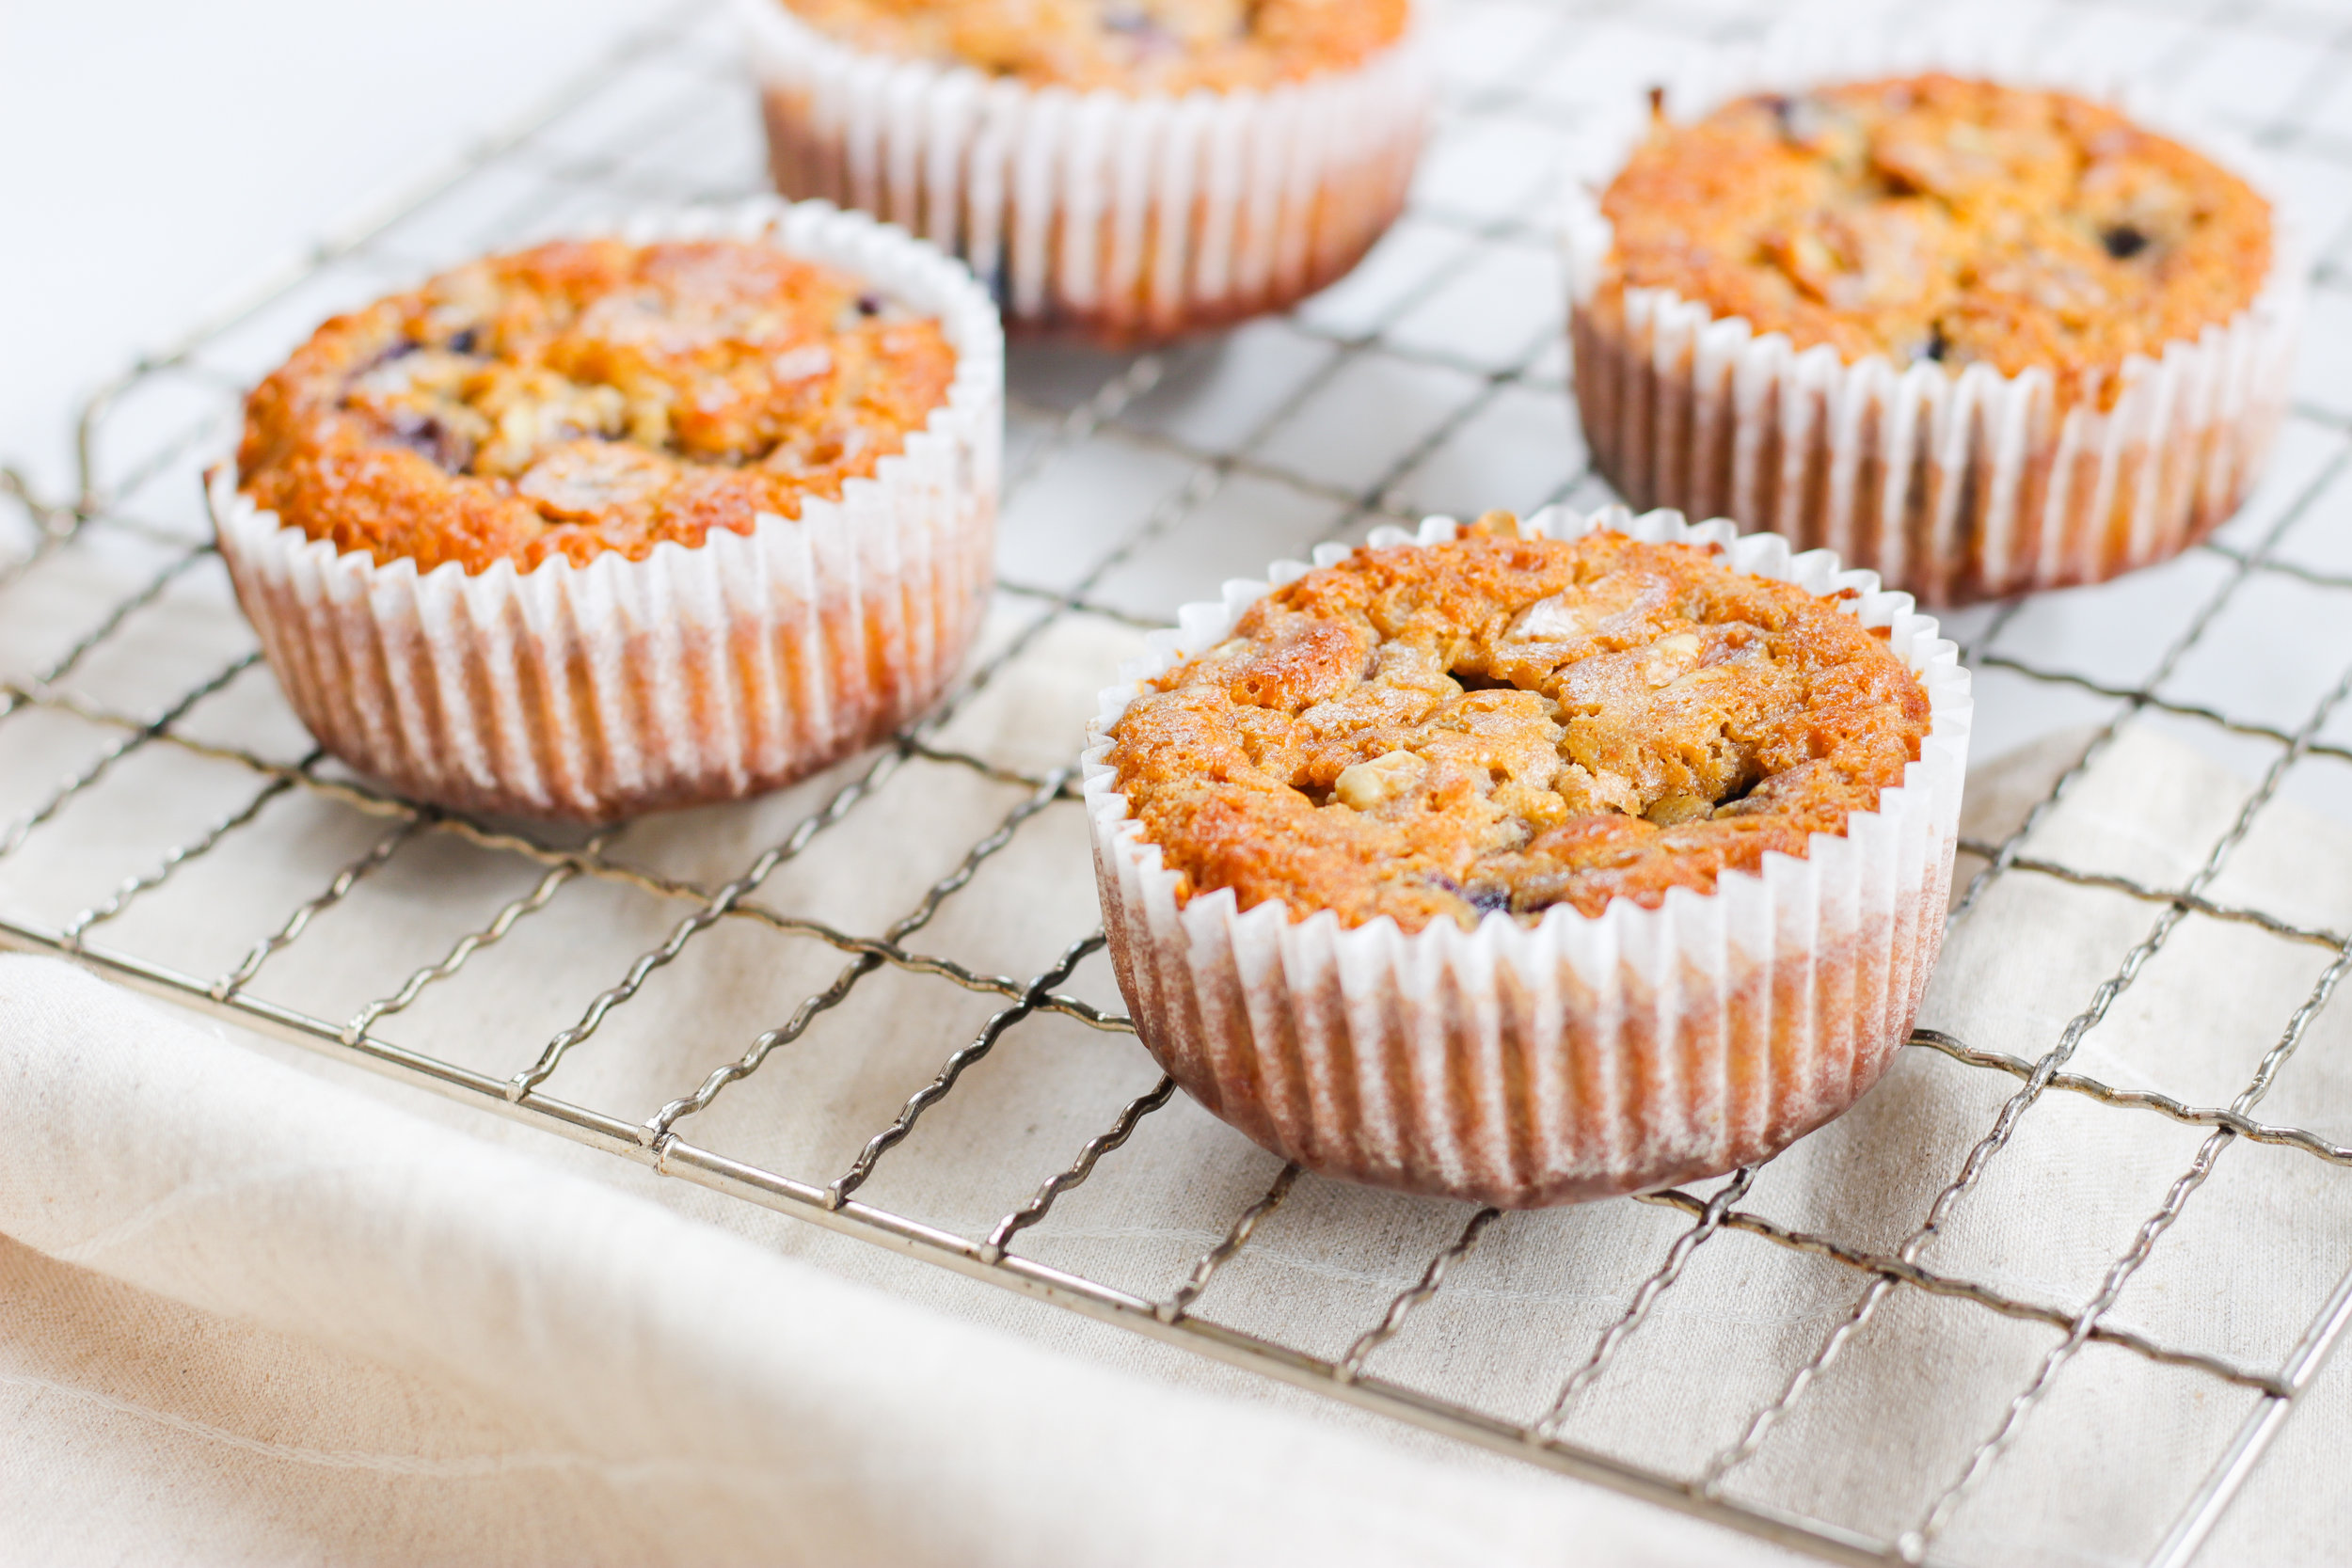 Blueberry and Walnut Muffin 1.jpg